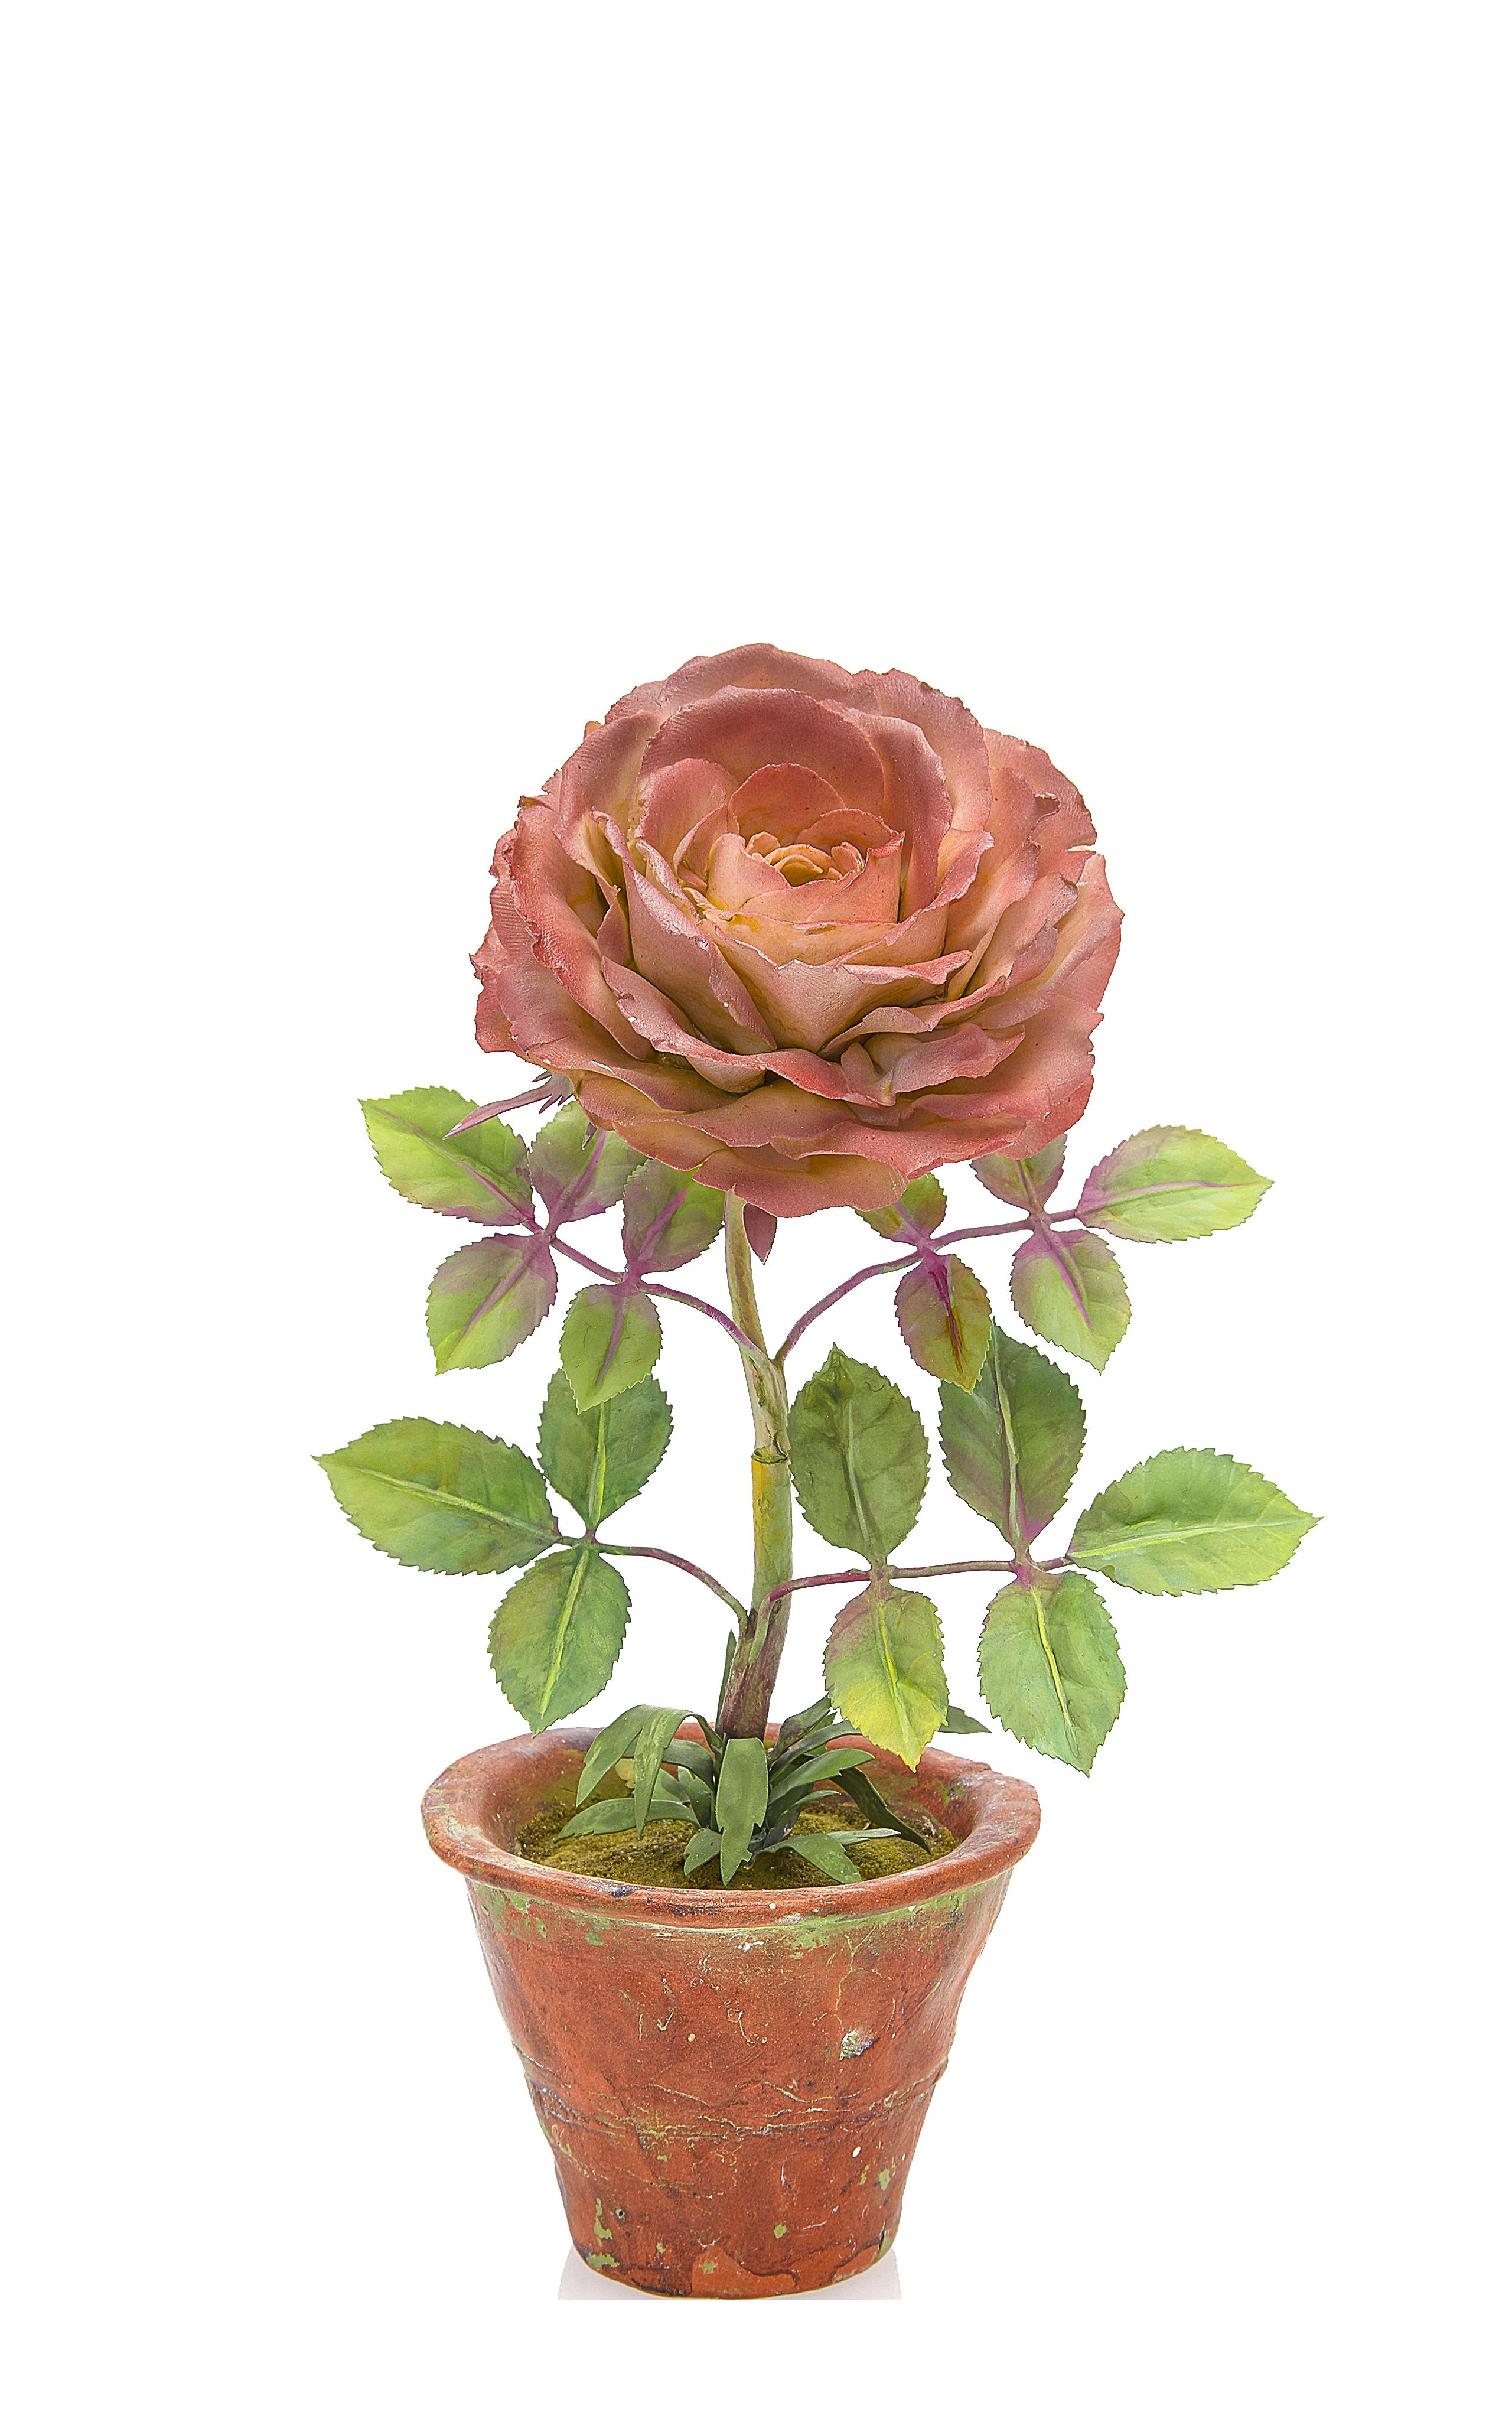 "Dark porcelain rose by Vladimir Kanevsky; $2,700. <a href=""https://www.modaoperandi.com/vladimir-kanevsky-gg18/dark-porcelain-rose?size=OS"" rel=""nofollow noopener"" target=""_blank"" data-ylk=""slk:Moda operandi.com"" class=""link rapid-noclick-resp"">Moda operandi.com</a>"